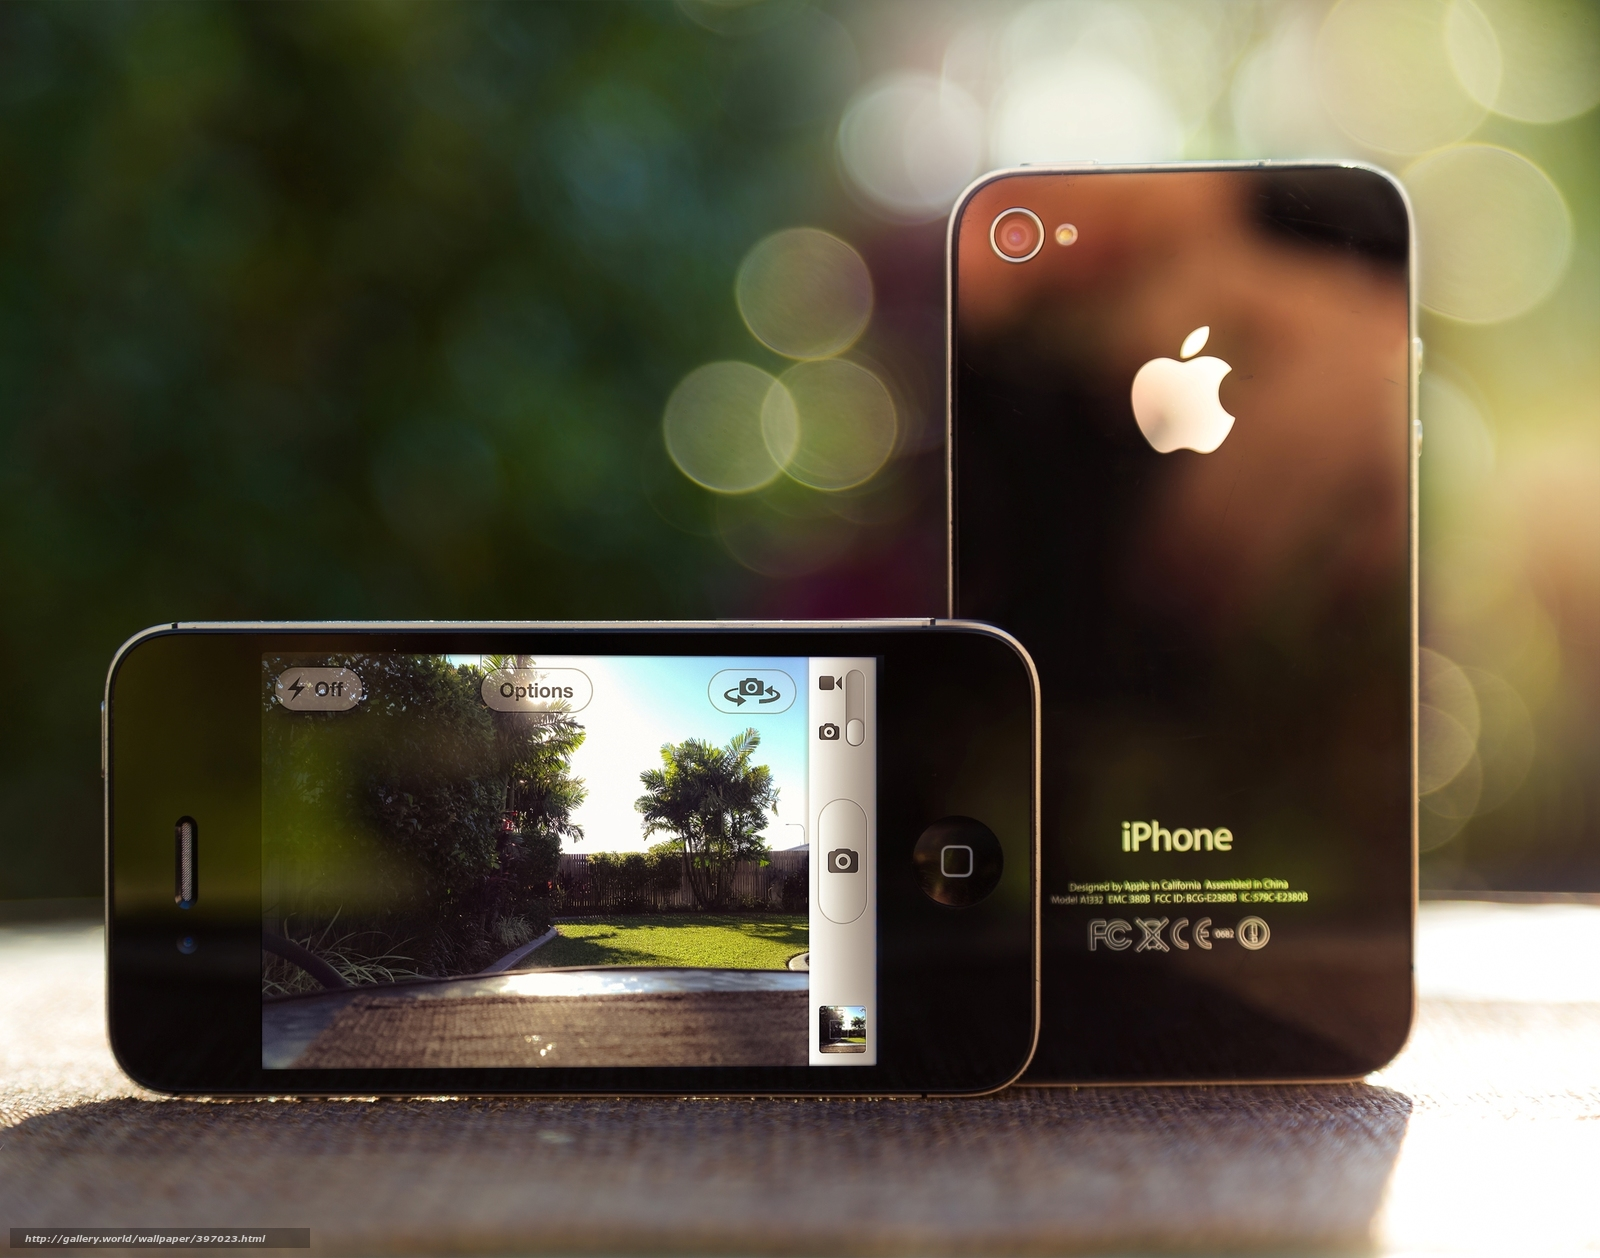 Iphone 4 Fond D Ecran Pour Smartphone Telechargement Gratuit 1600x1258 Wallpapertip